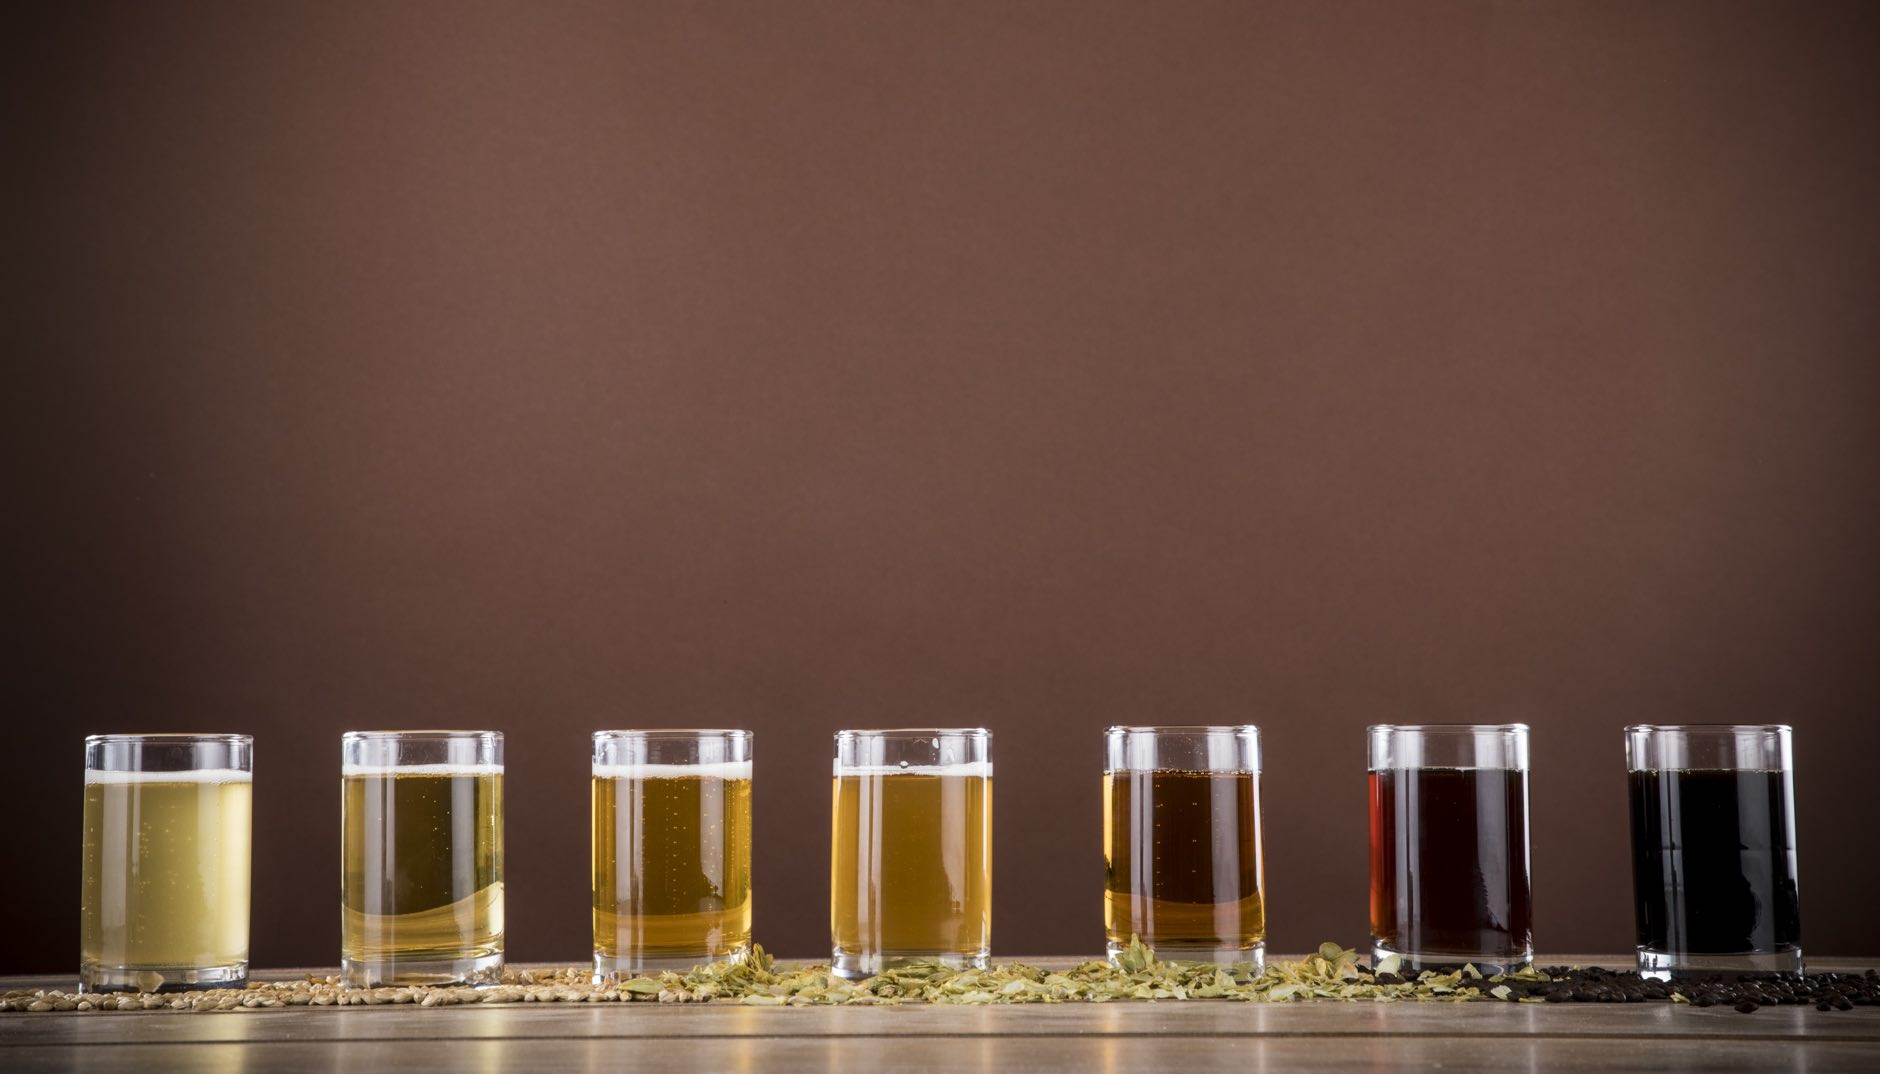 cerveza artesanal otoño temporada